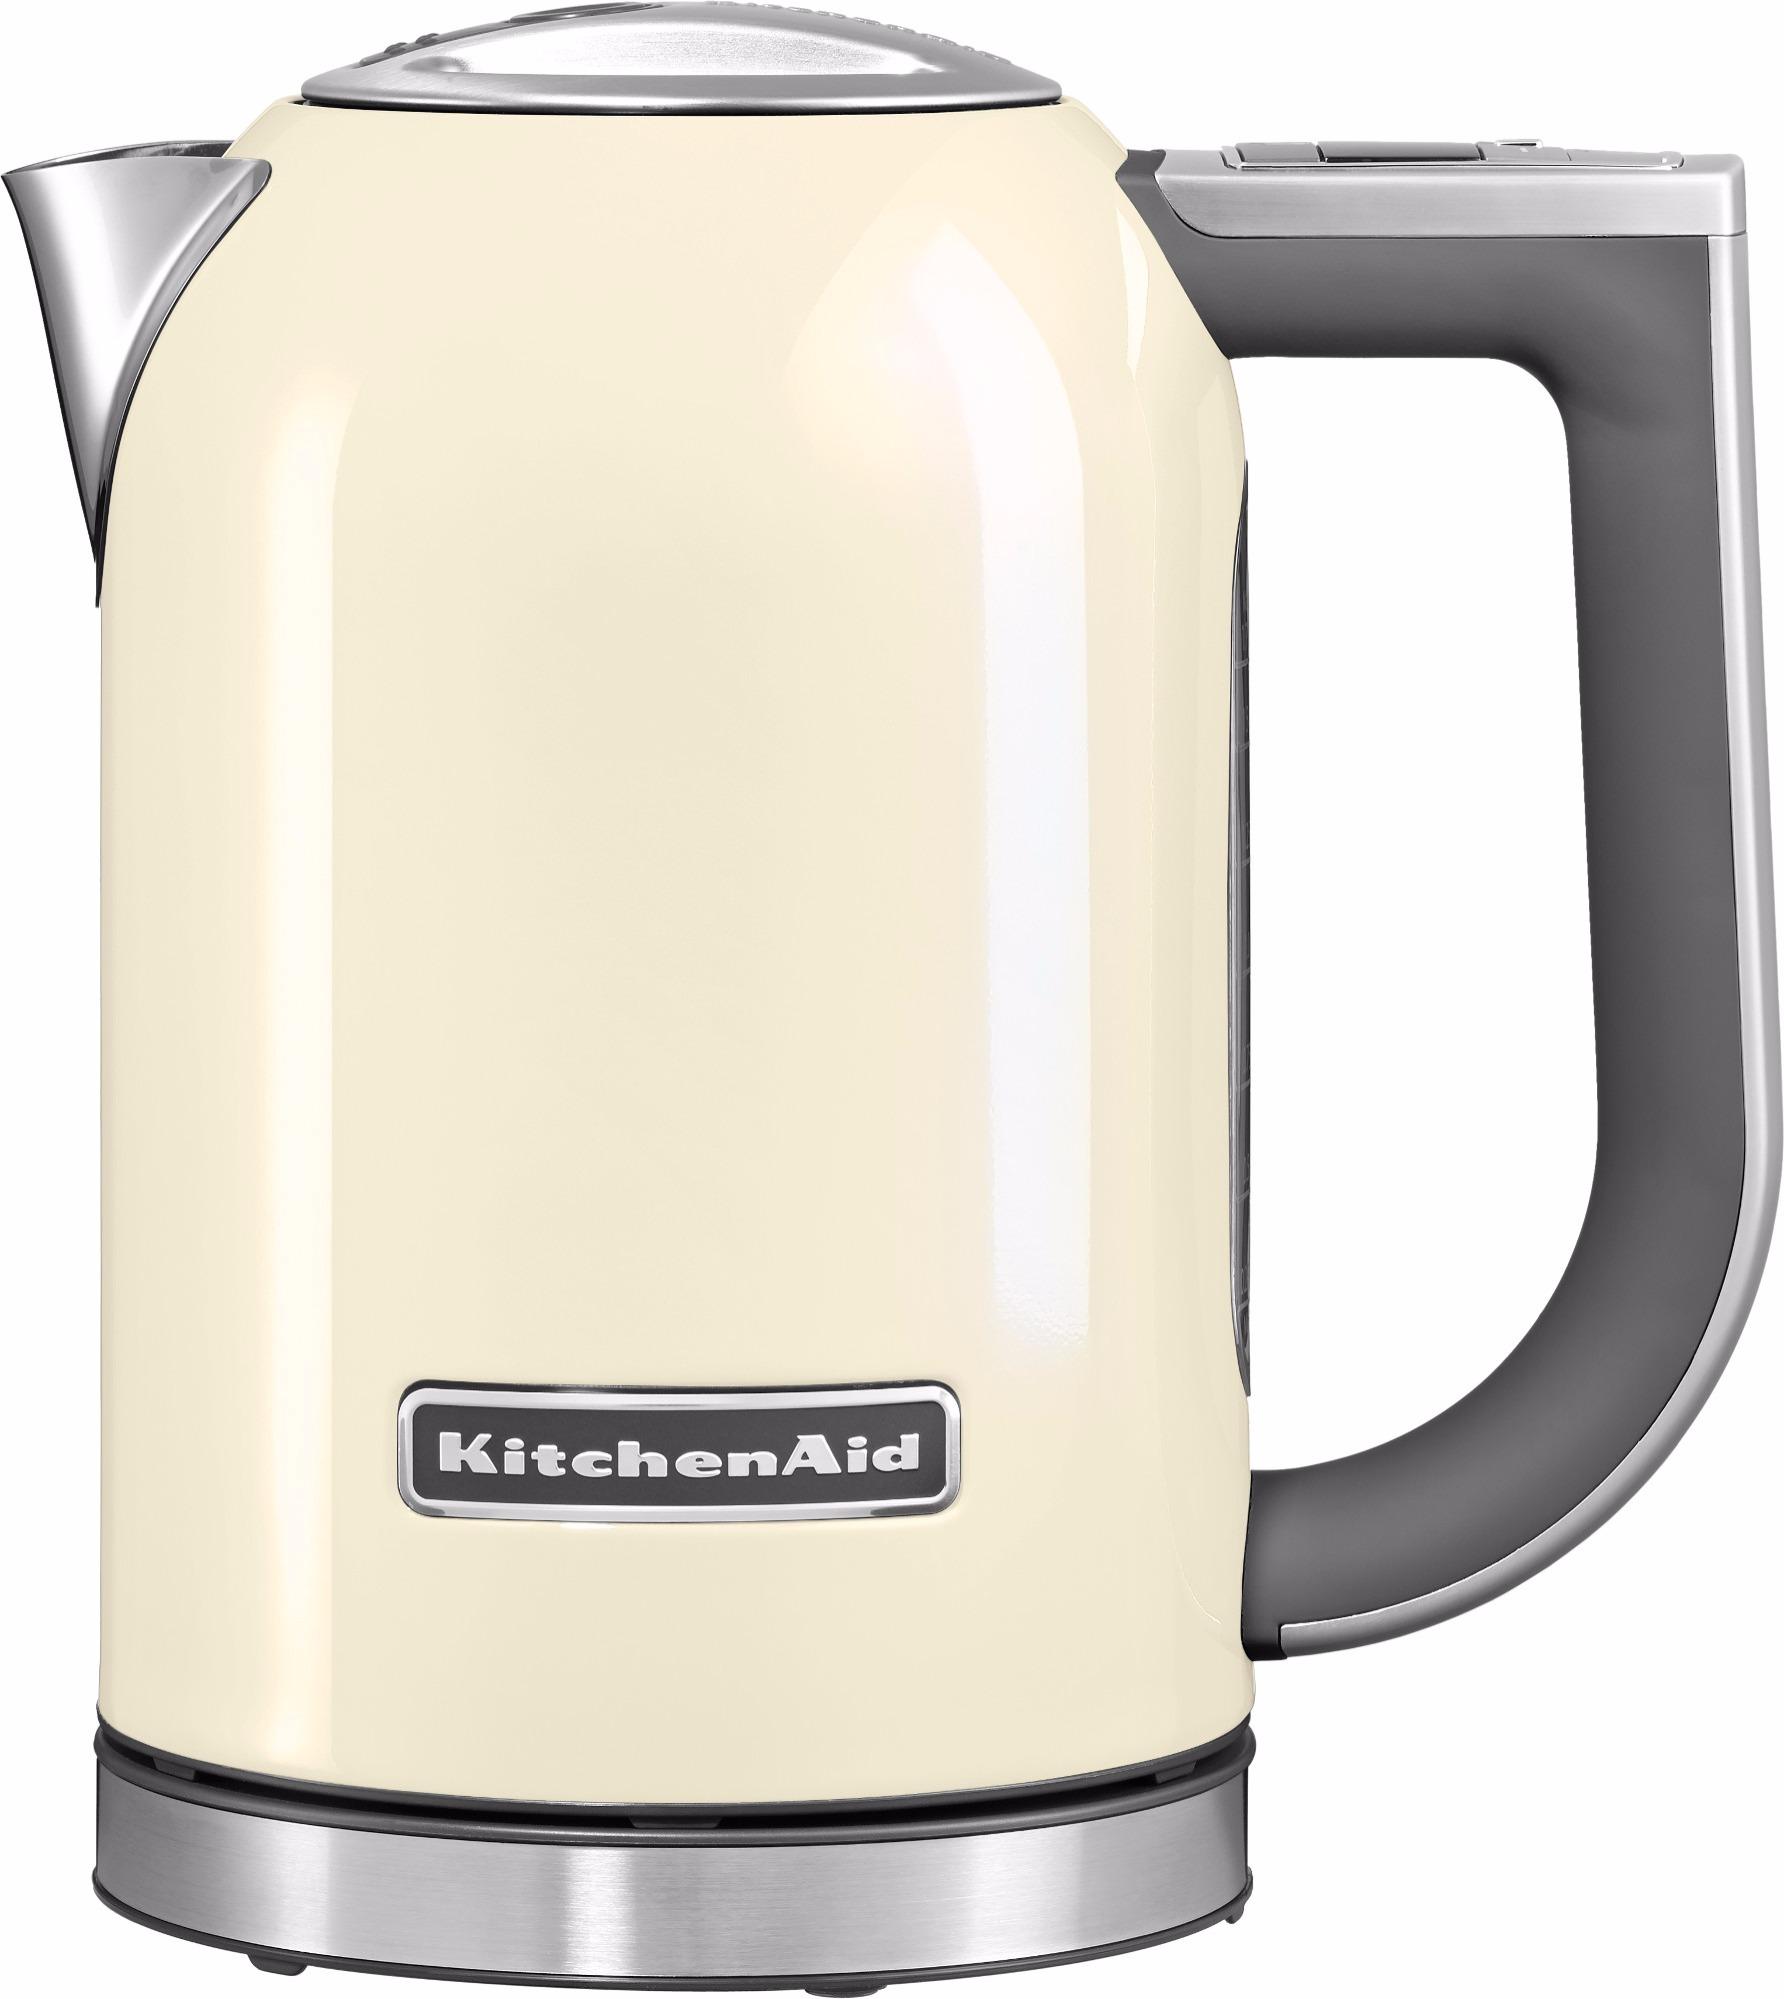 KitchenAid 1722EAC Electric Kettle 1,7 l, Almond Cream